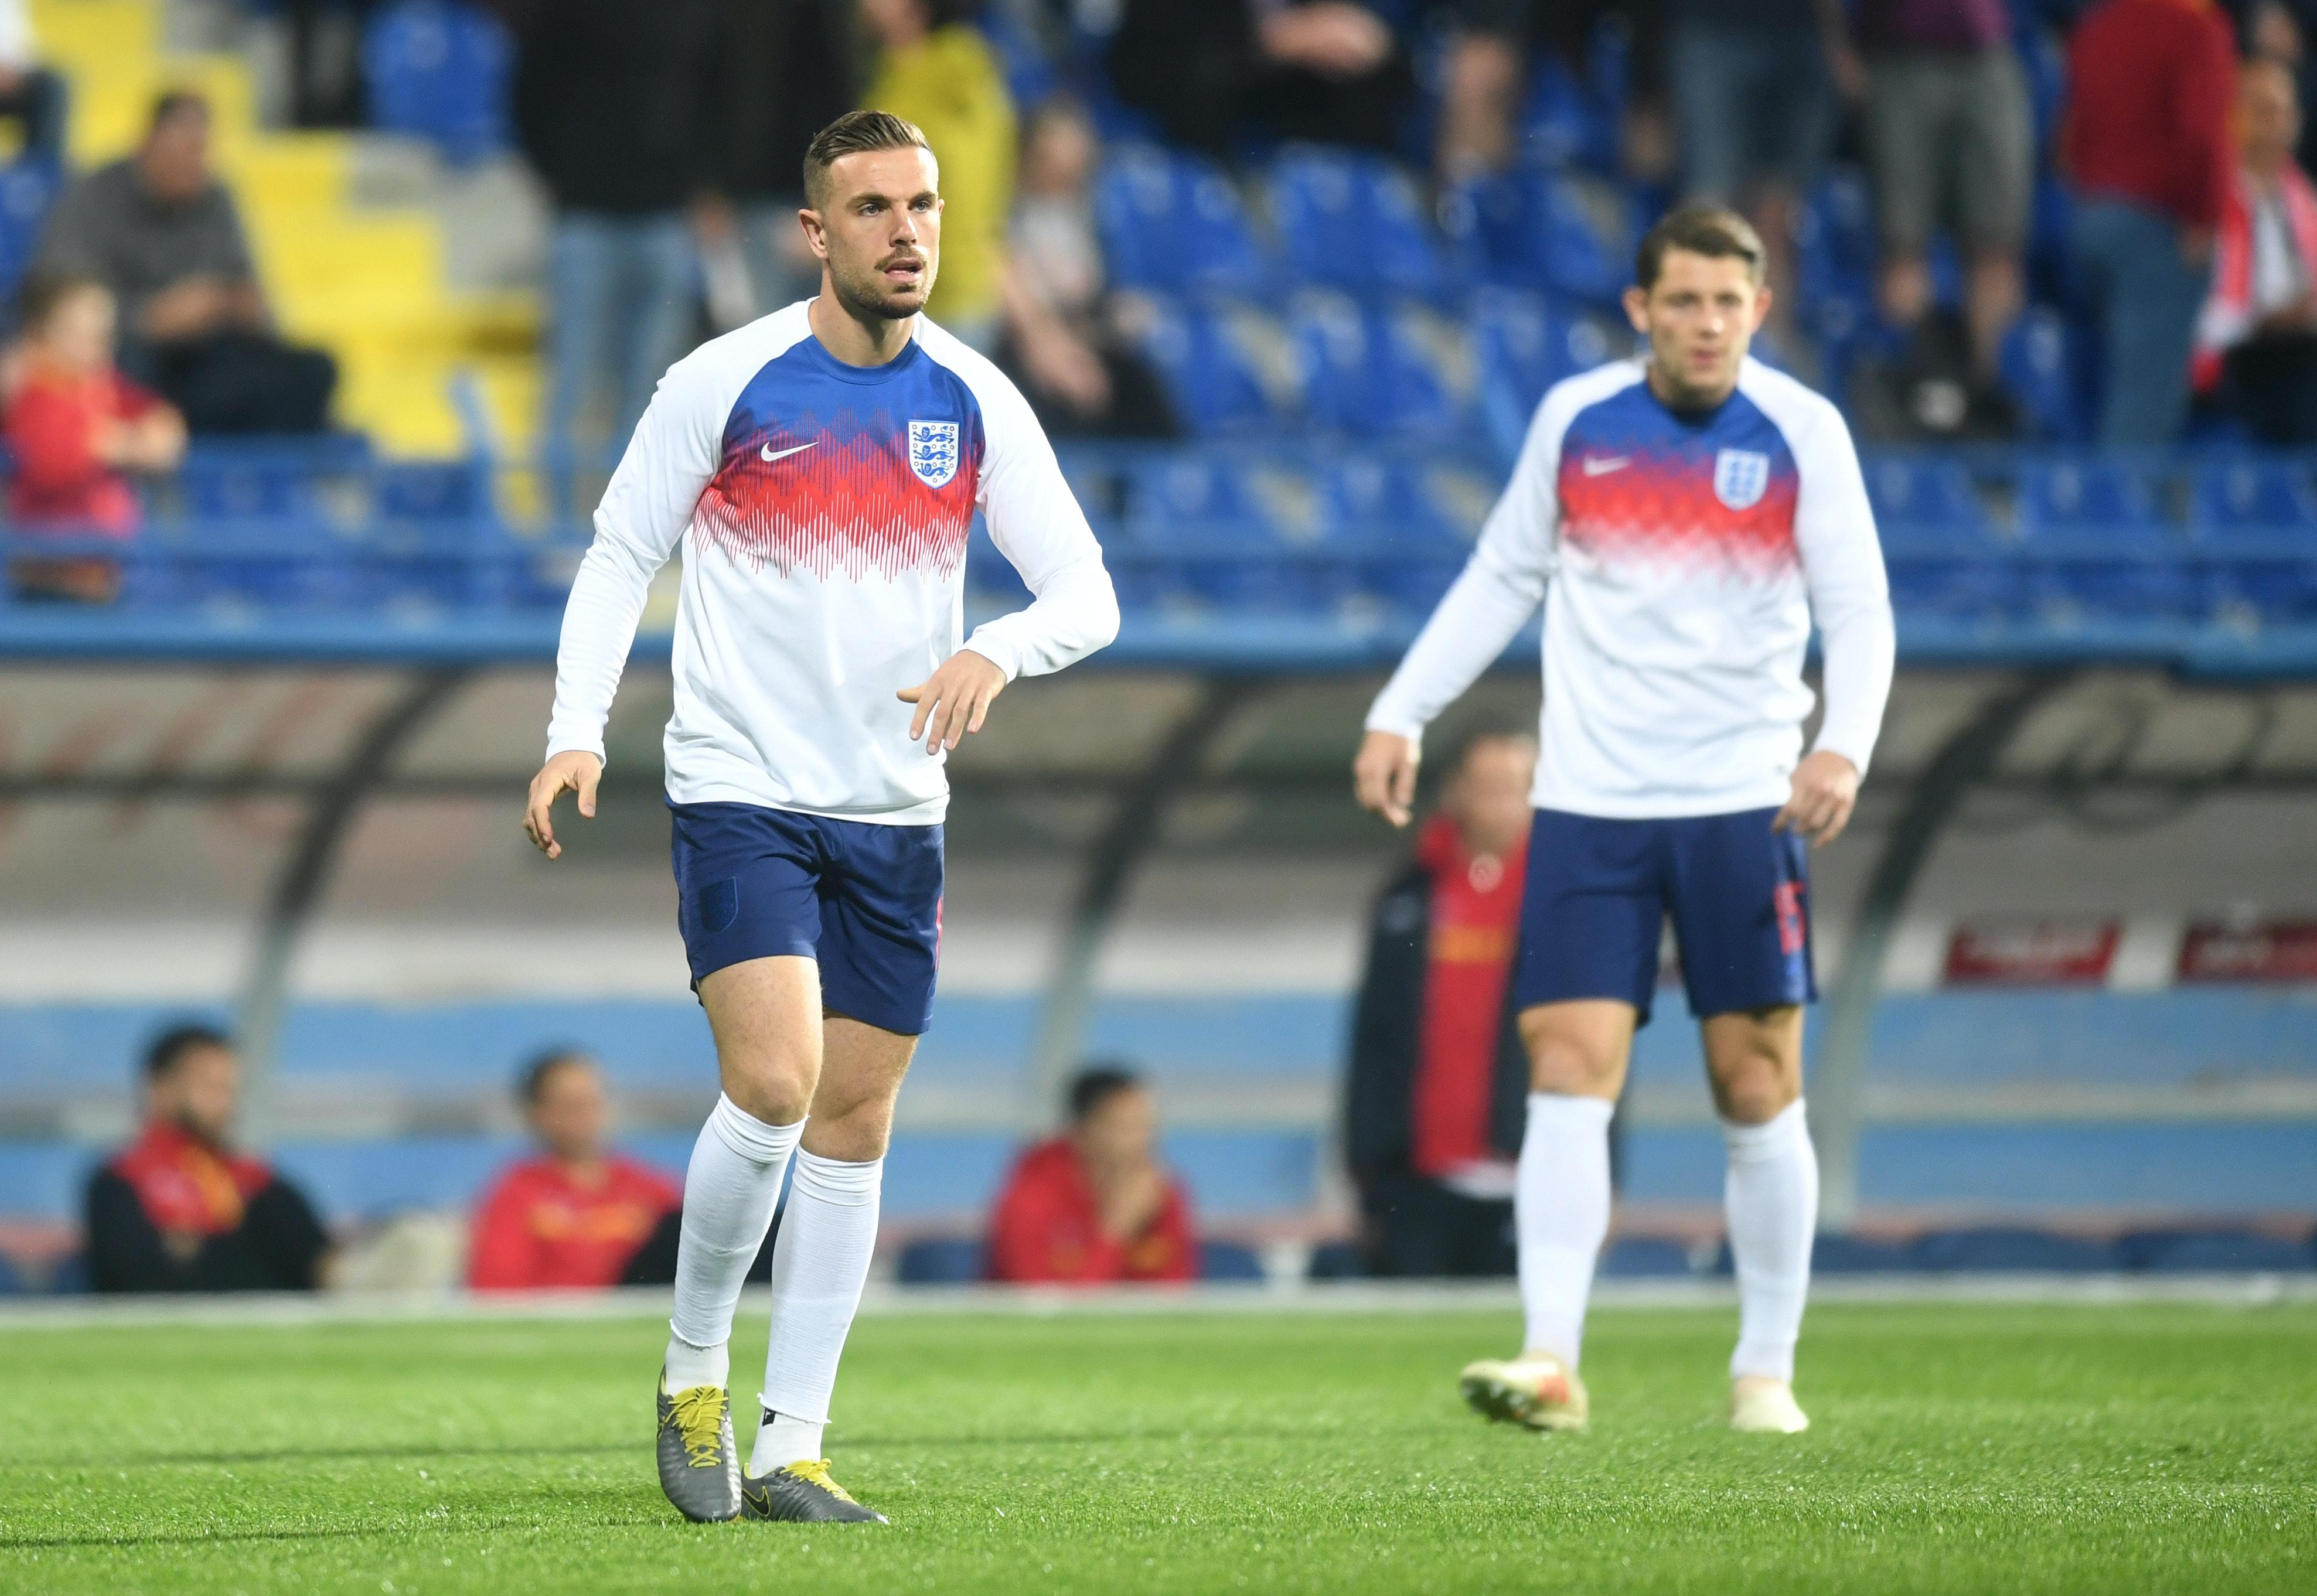 Henderson med målgivende i sin jubileumskamp